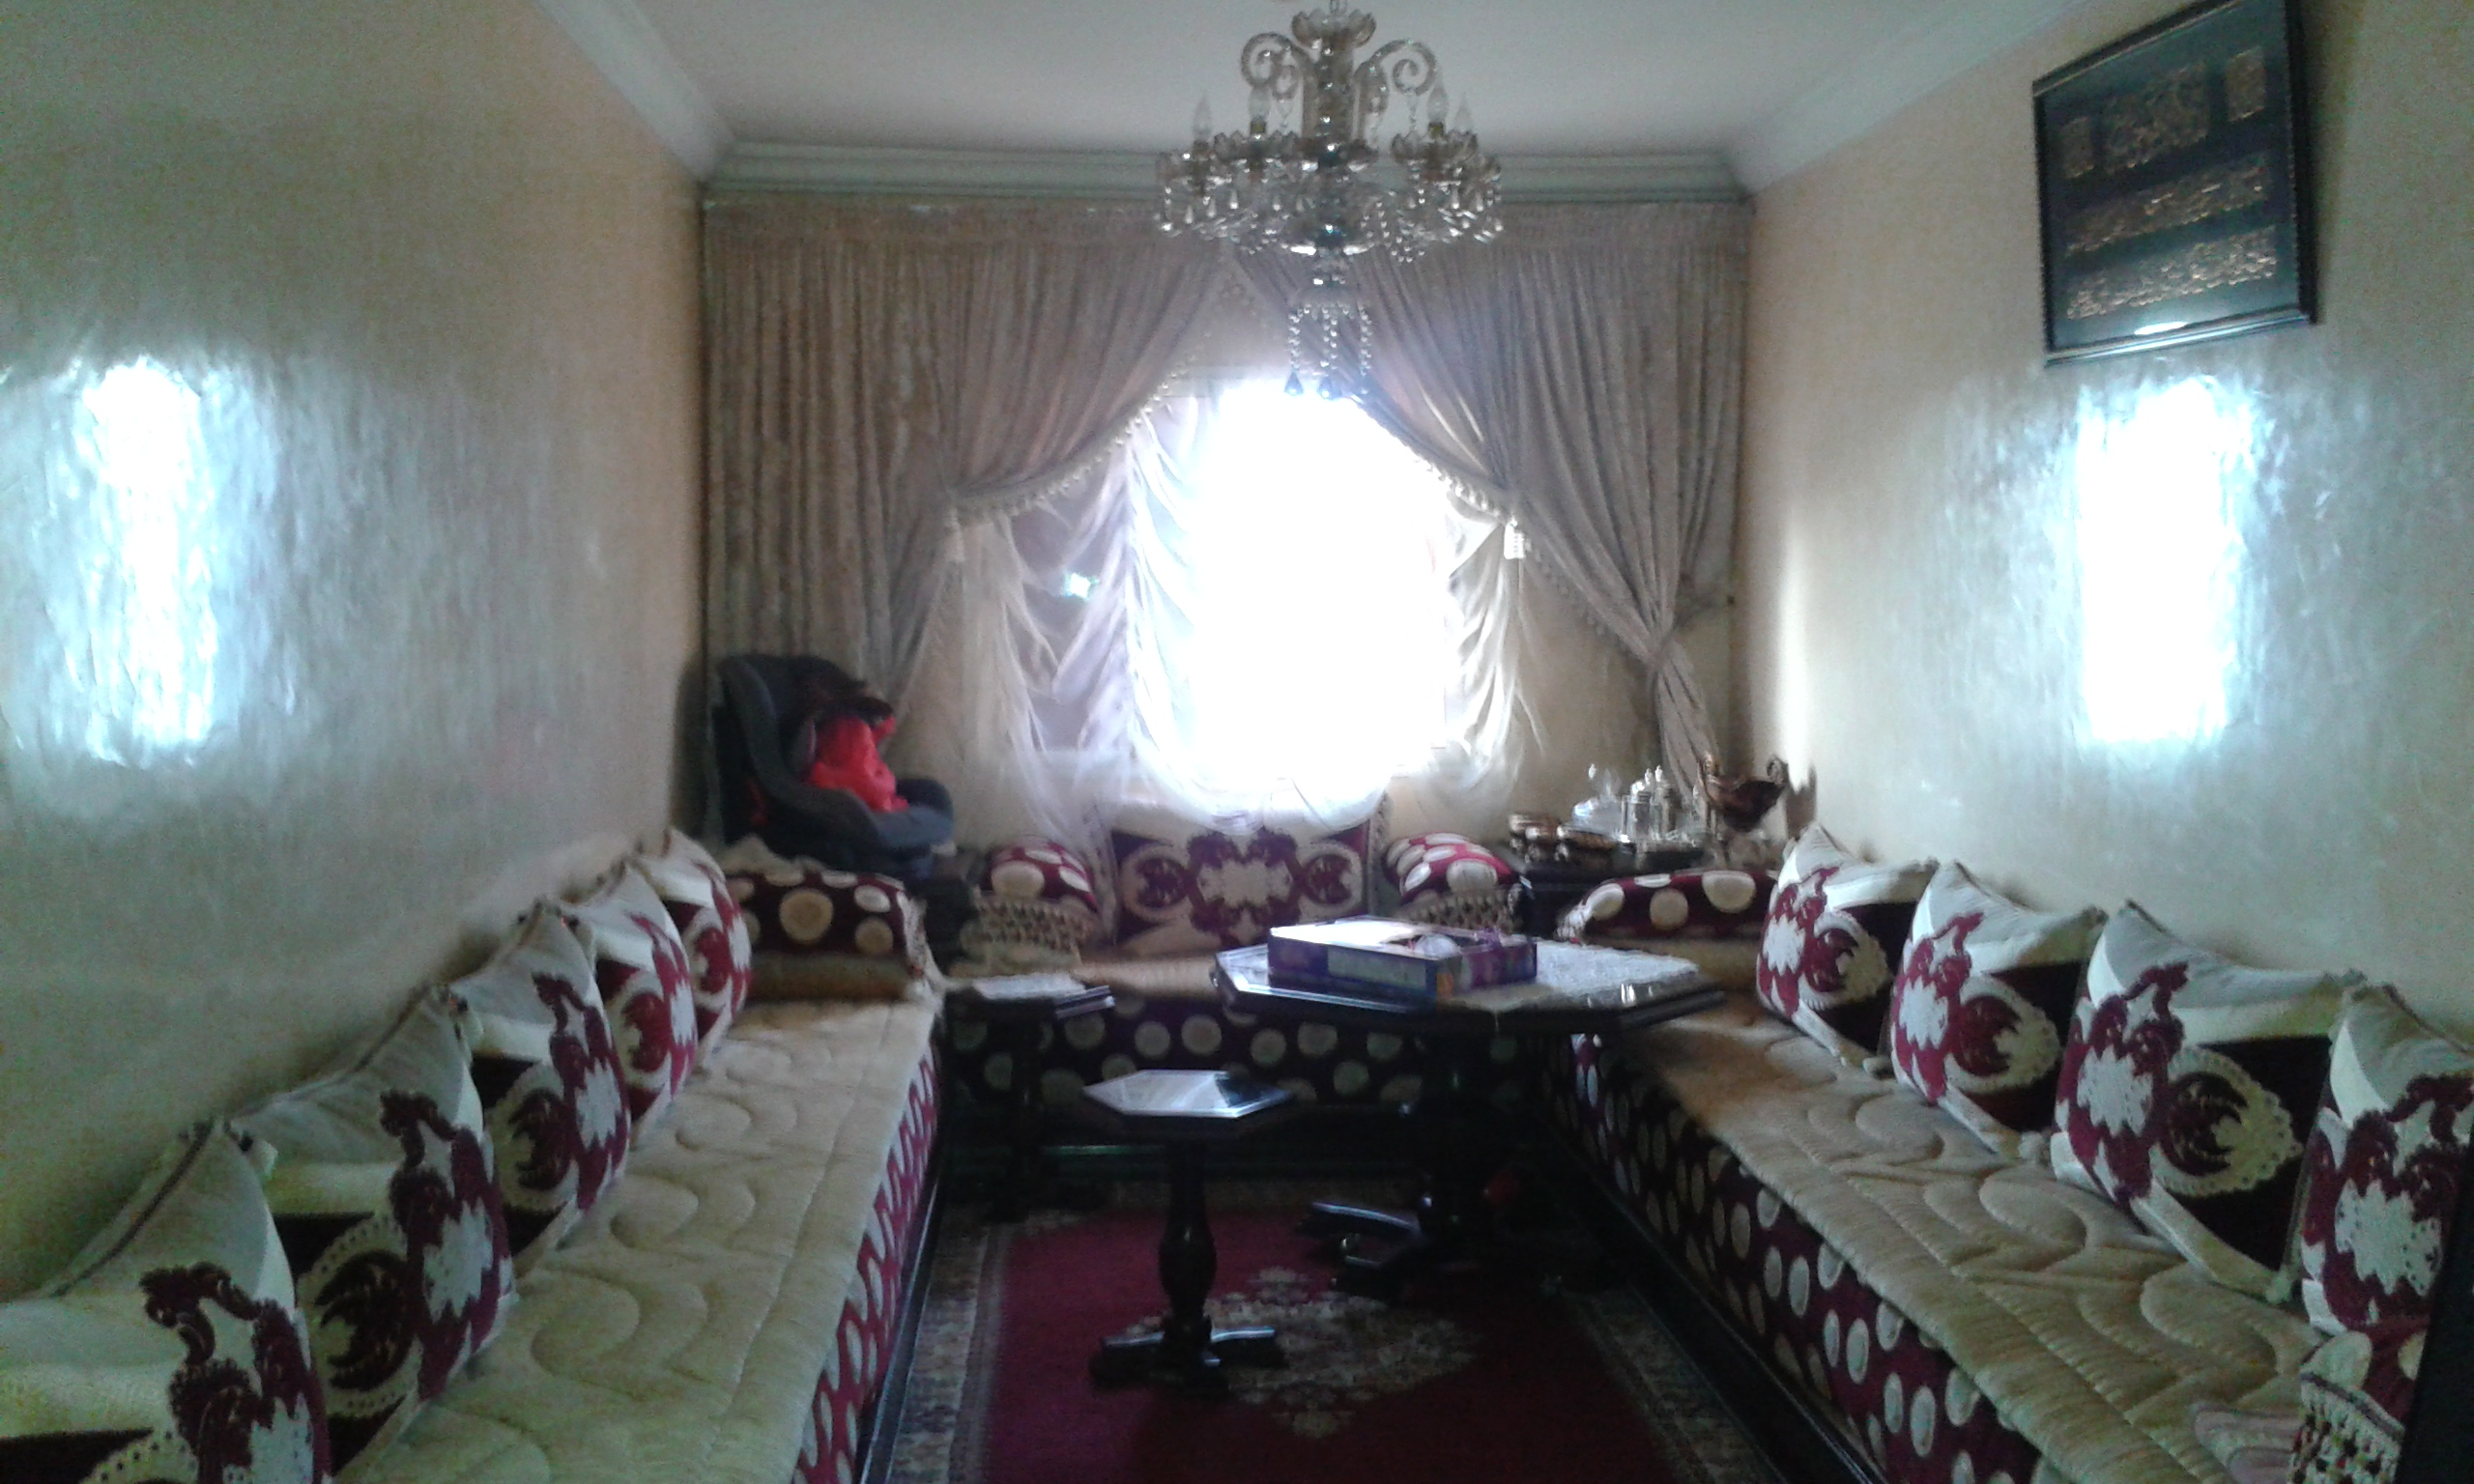 Salon Marocain A Vendre Avito: Salon marocain à vendre à mohammedia ...